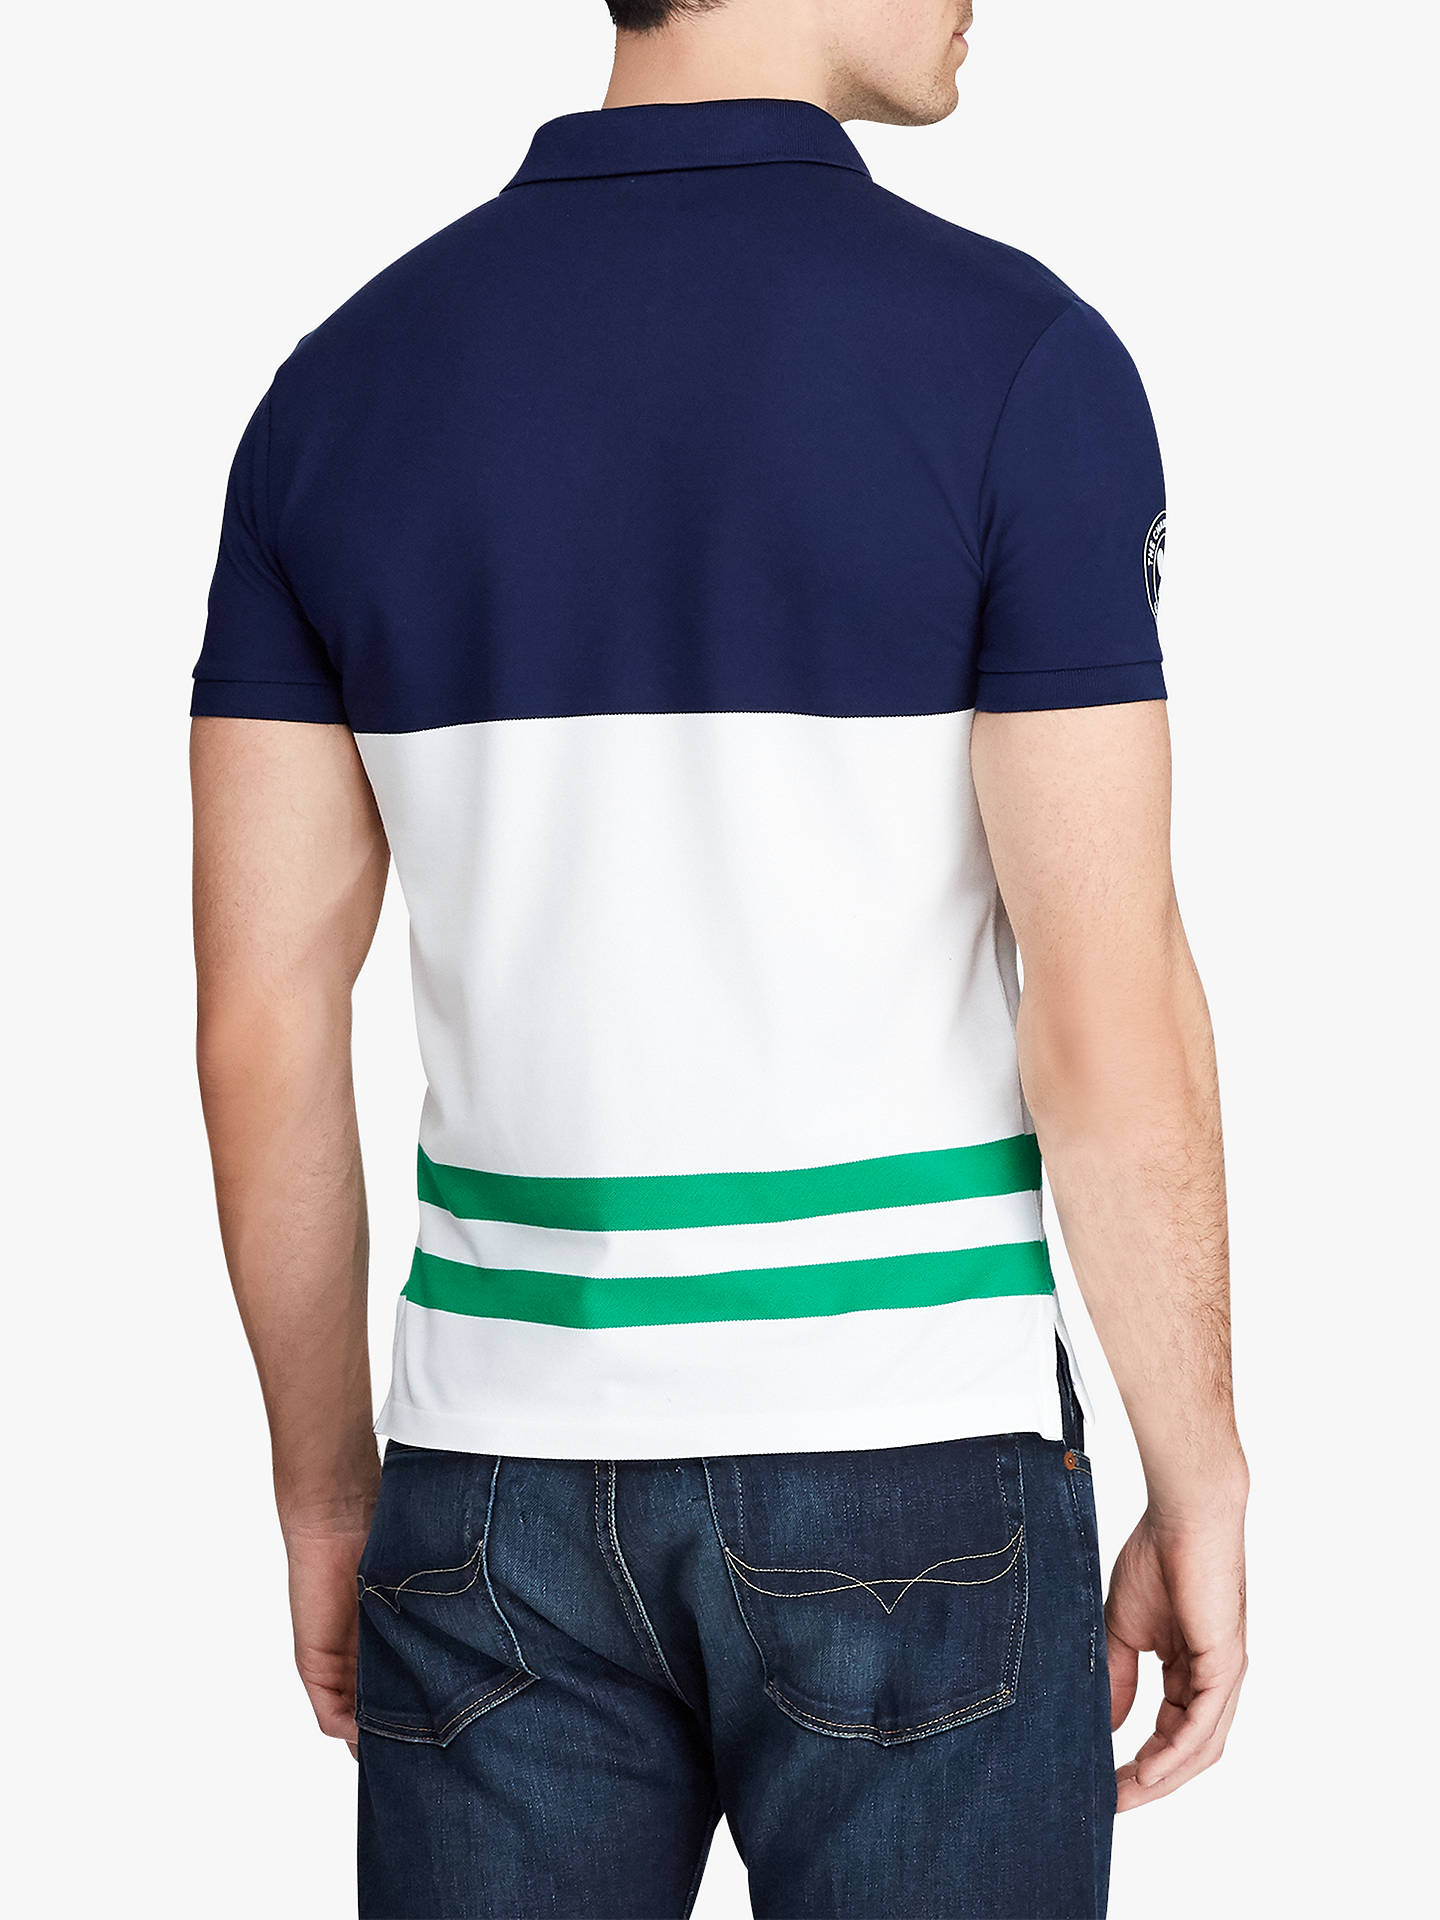 22d569bb54 Polo Ralph Lauren Wimbledon Stretch Mesh Slim Fit Polo Shirt, French Navy  Multi